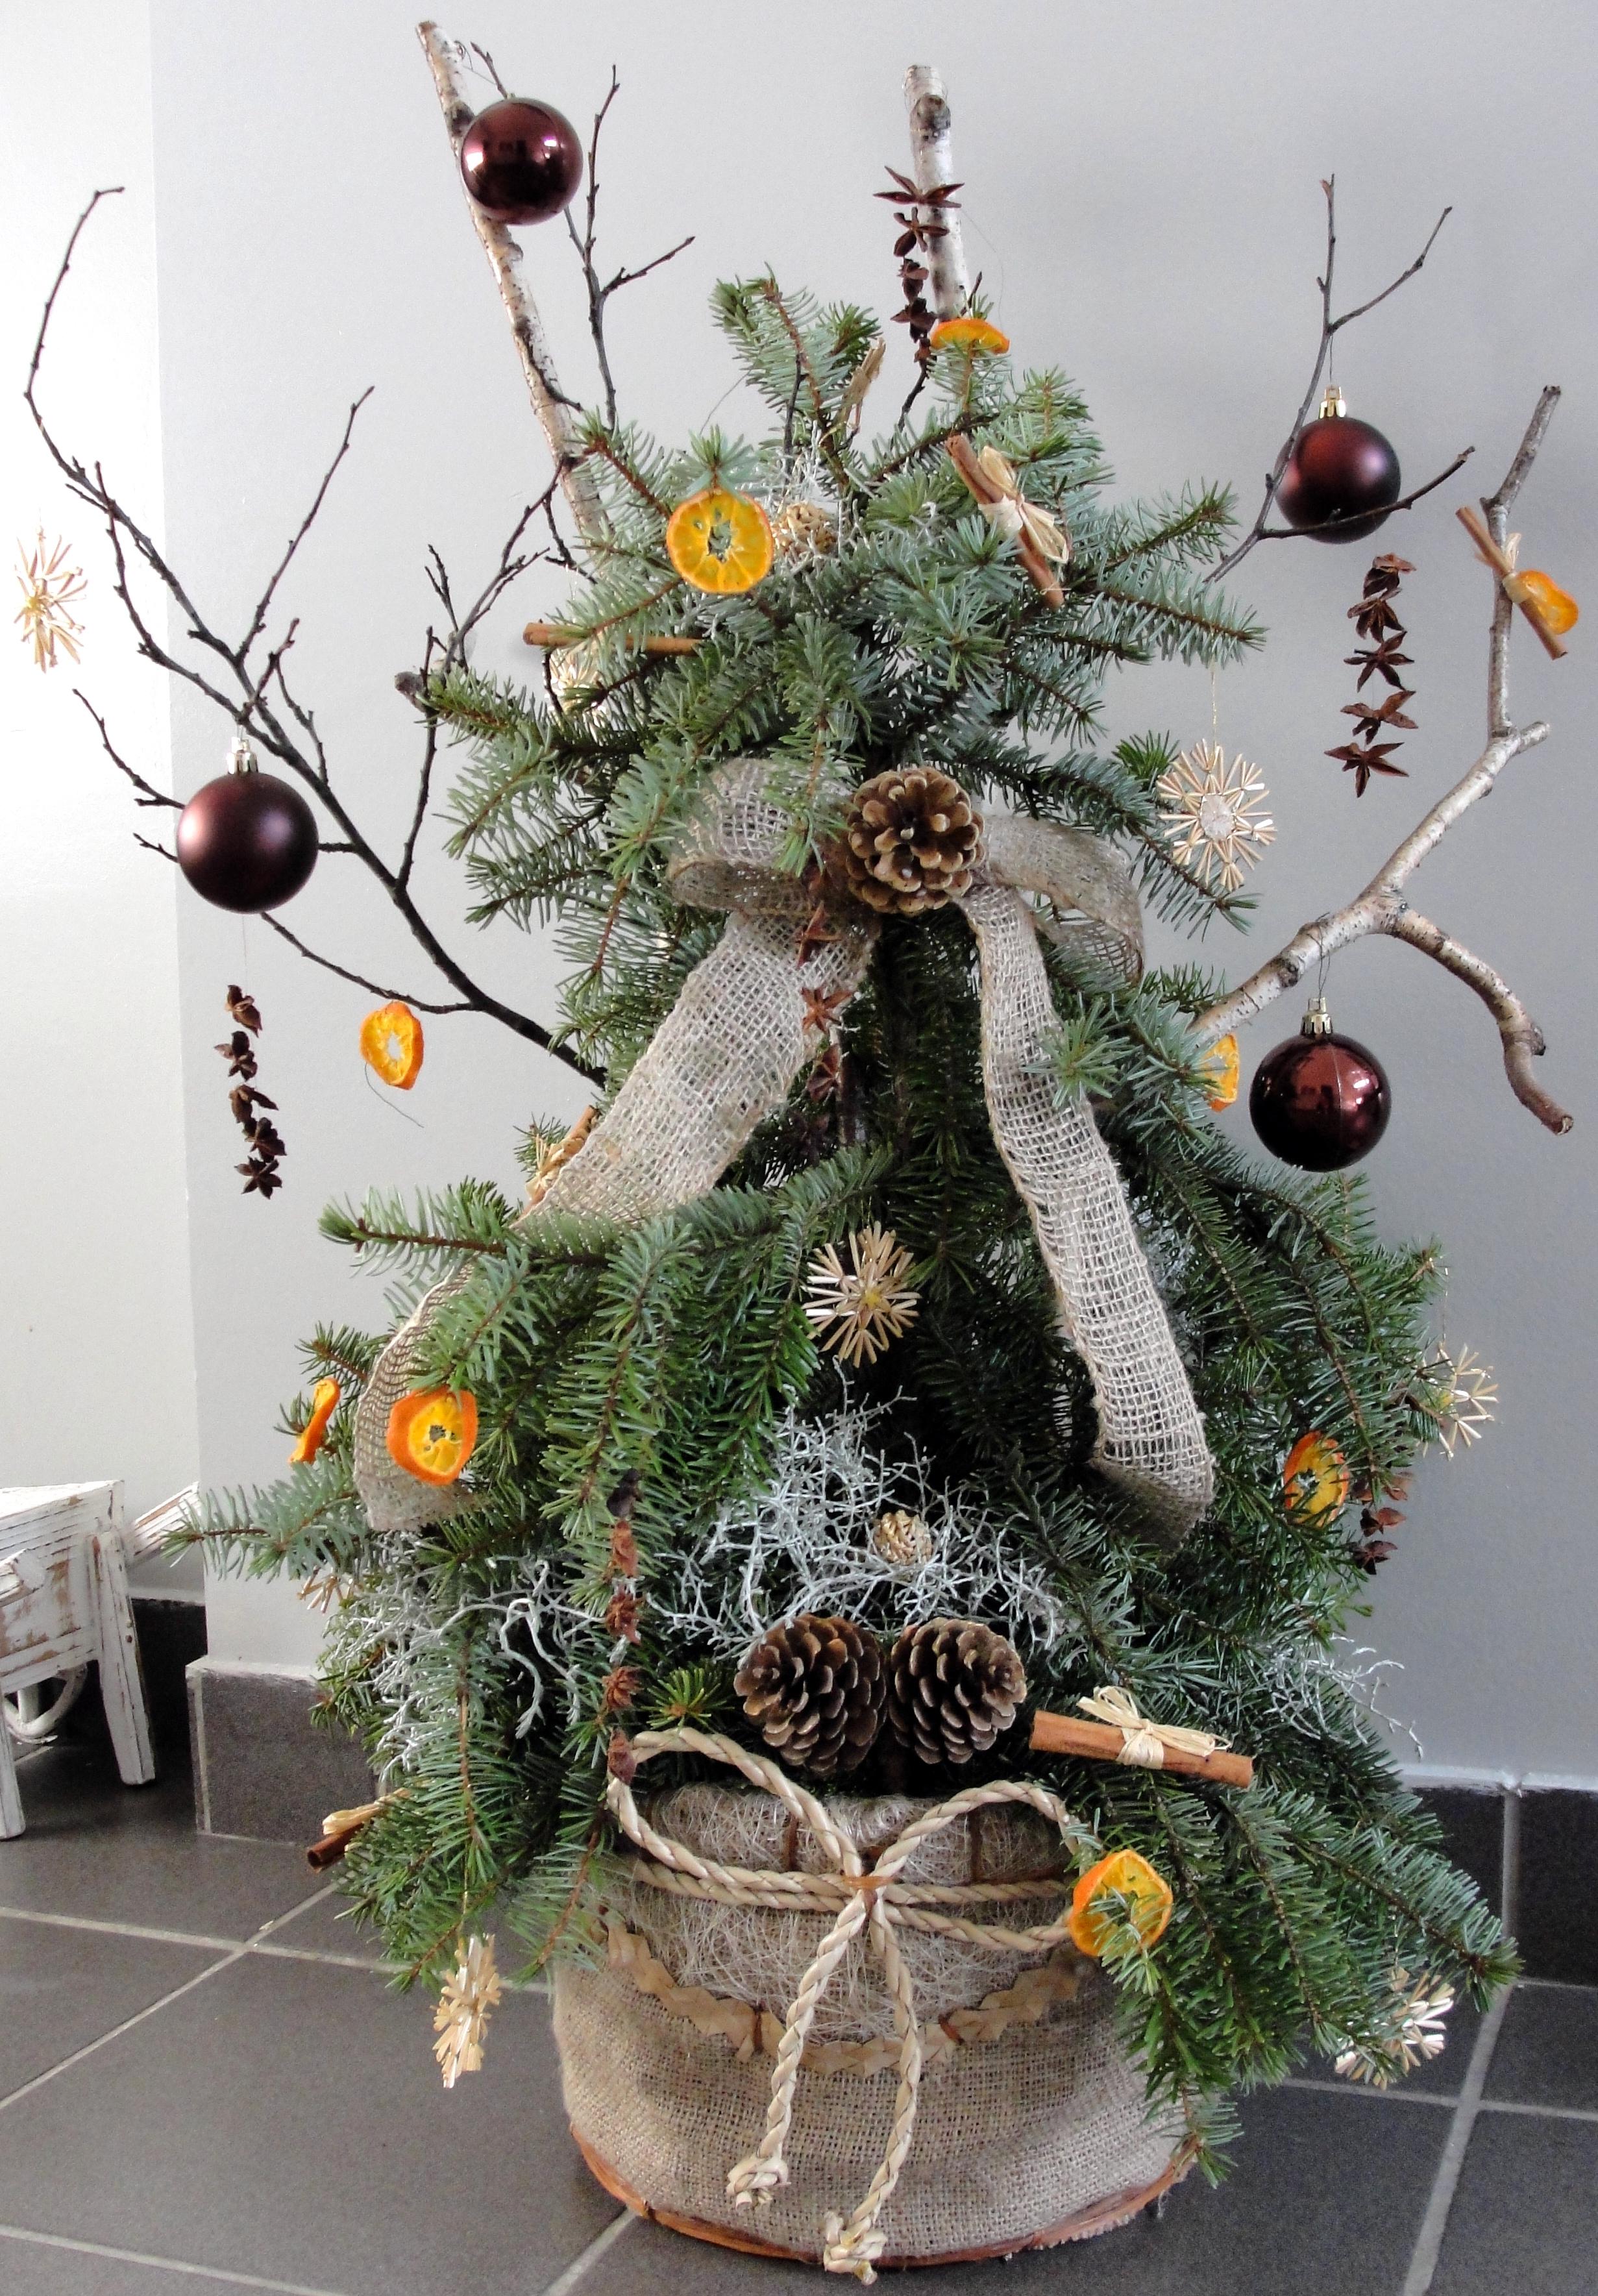 Free Images Christmas Decoration Flowerpot Christmas Tree Plant